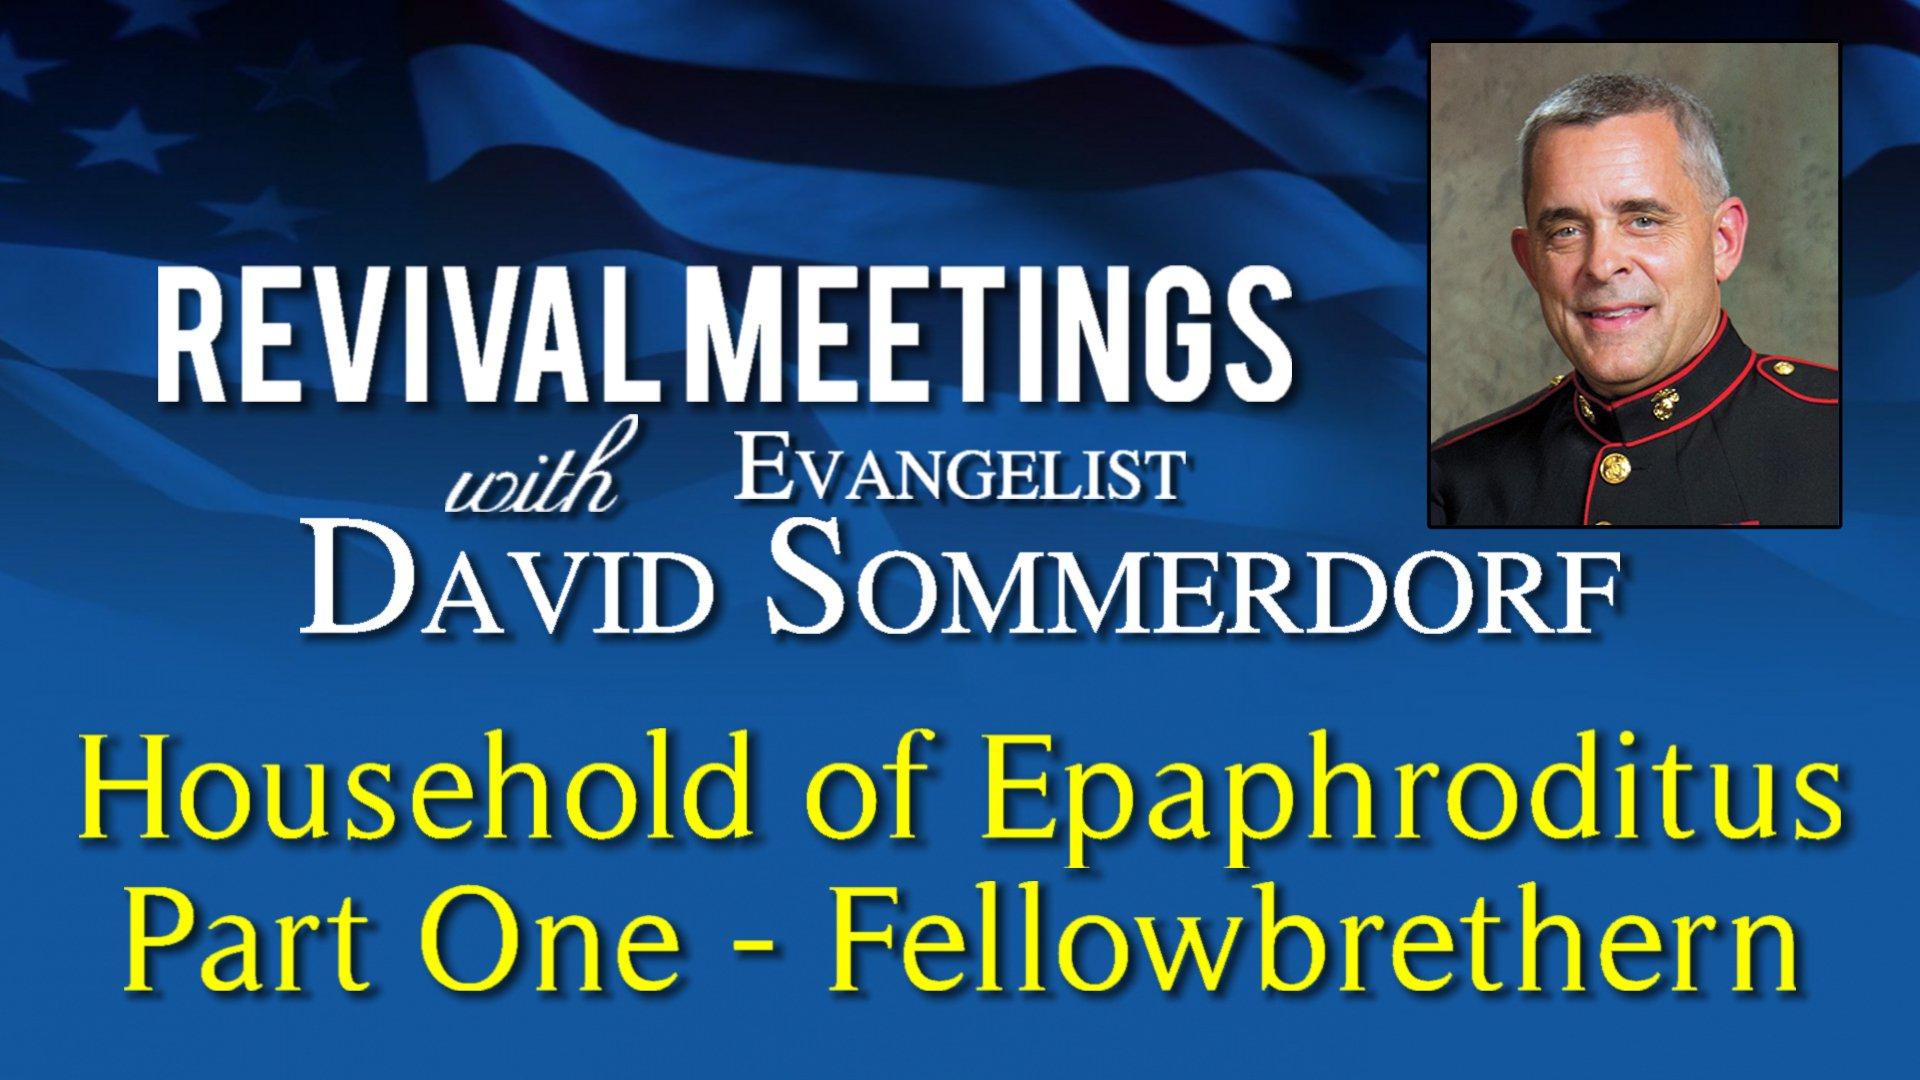 Household of Epaphroditus – Part 1 Fellowbrethern